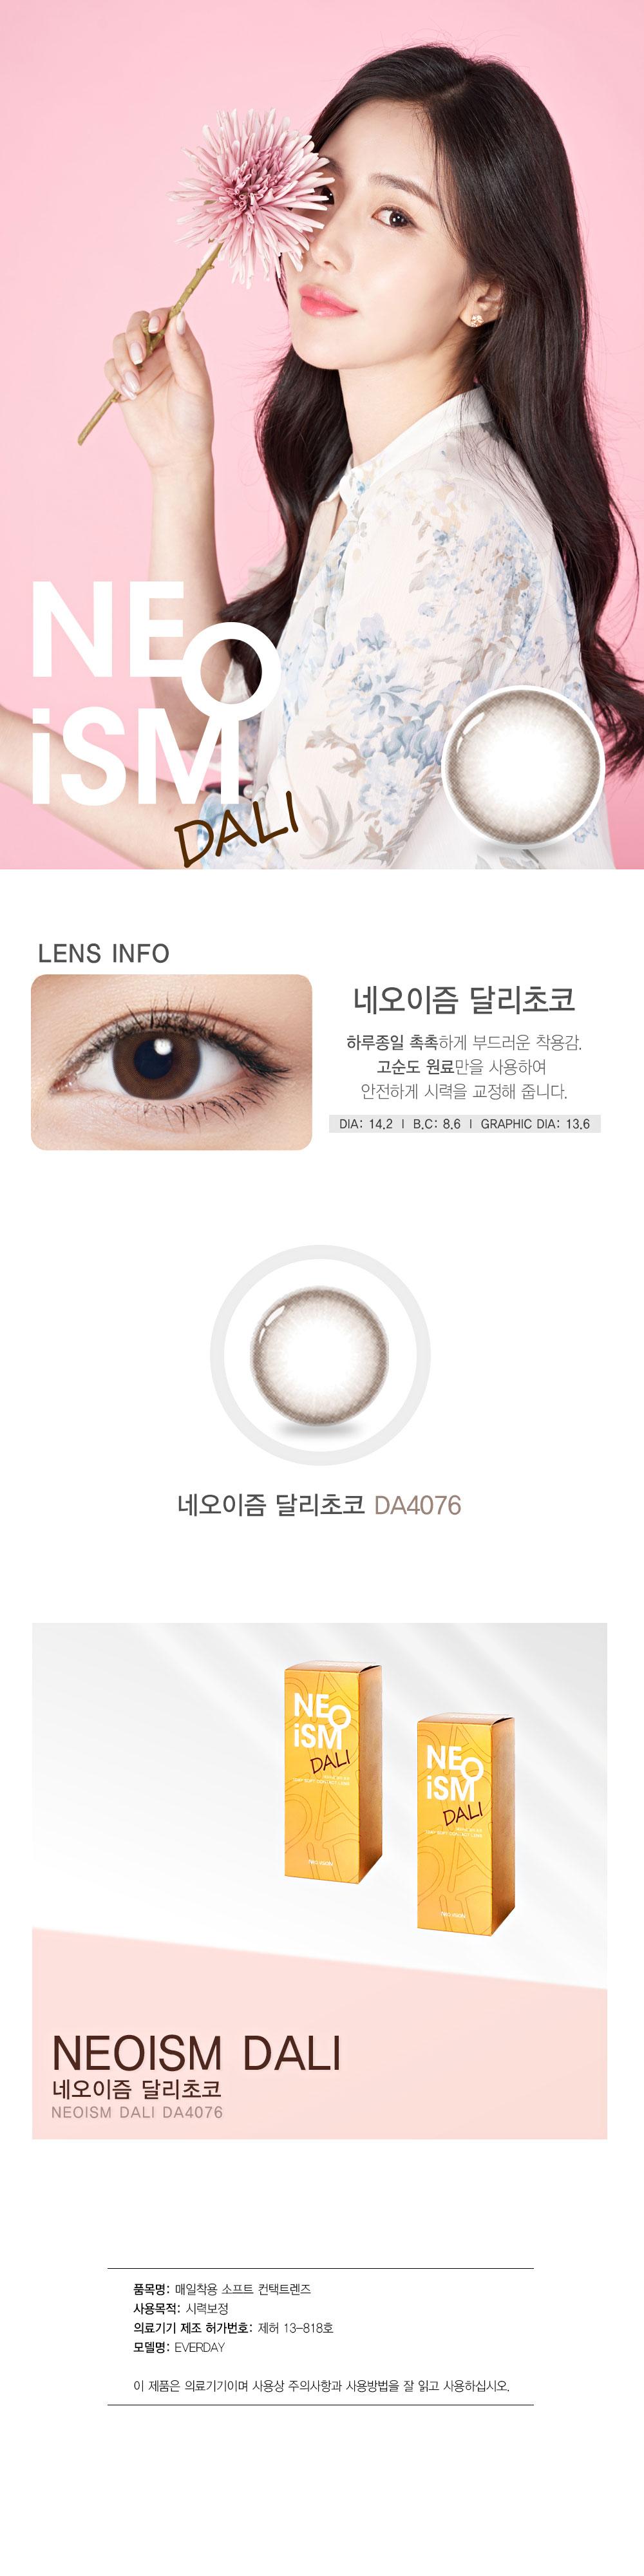 neoism-1day-dali-cohco-korean-colored-contact-lenses.jpg